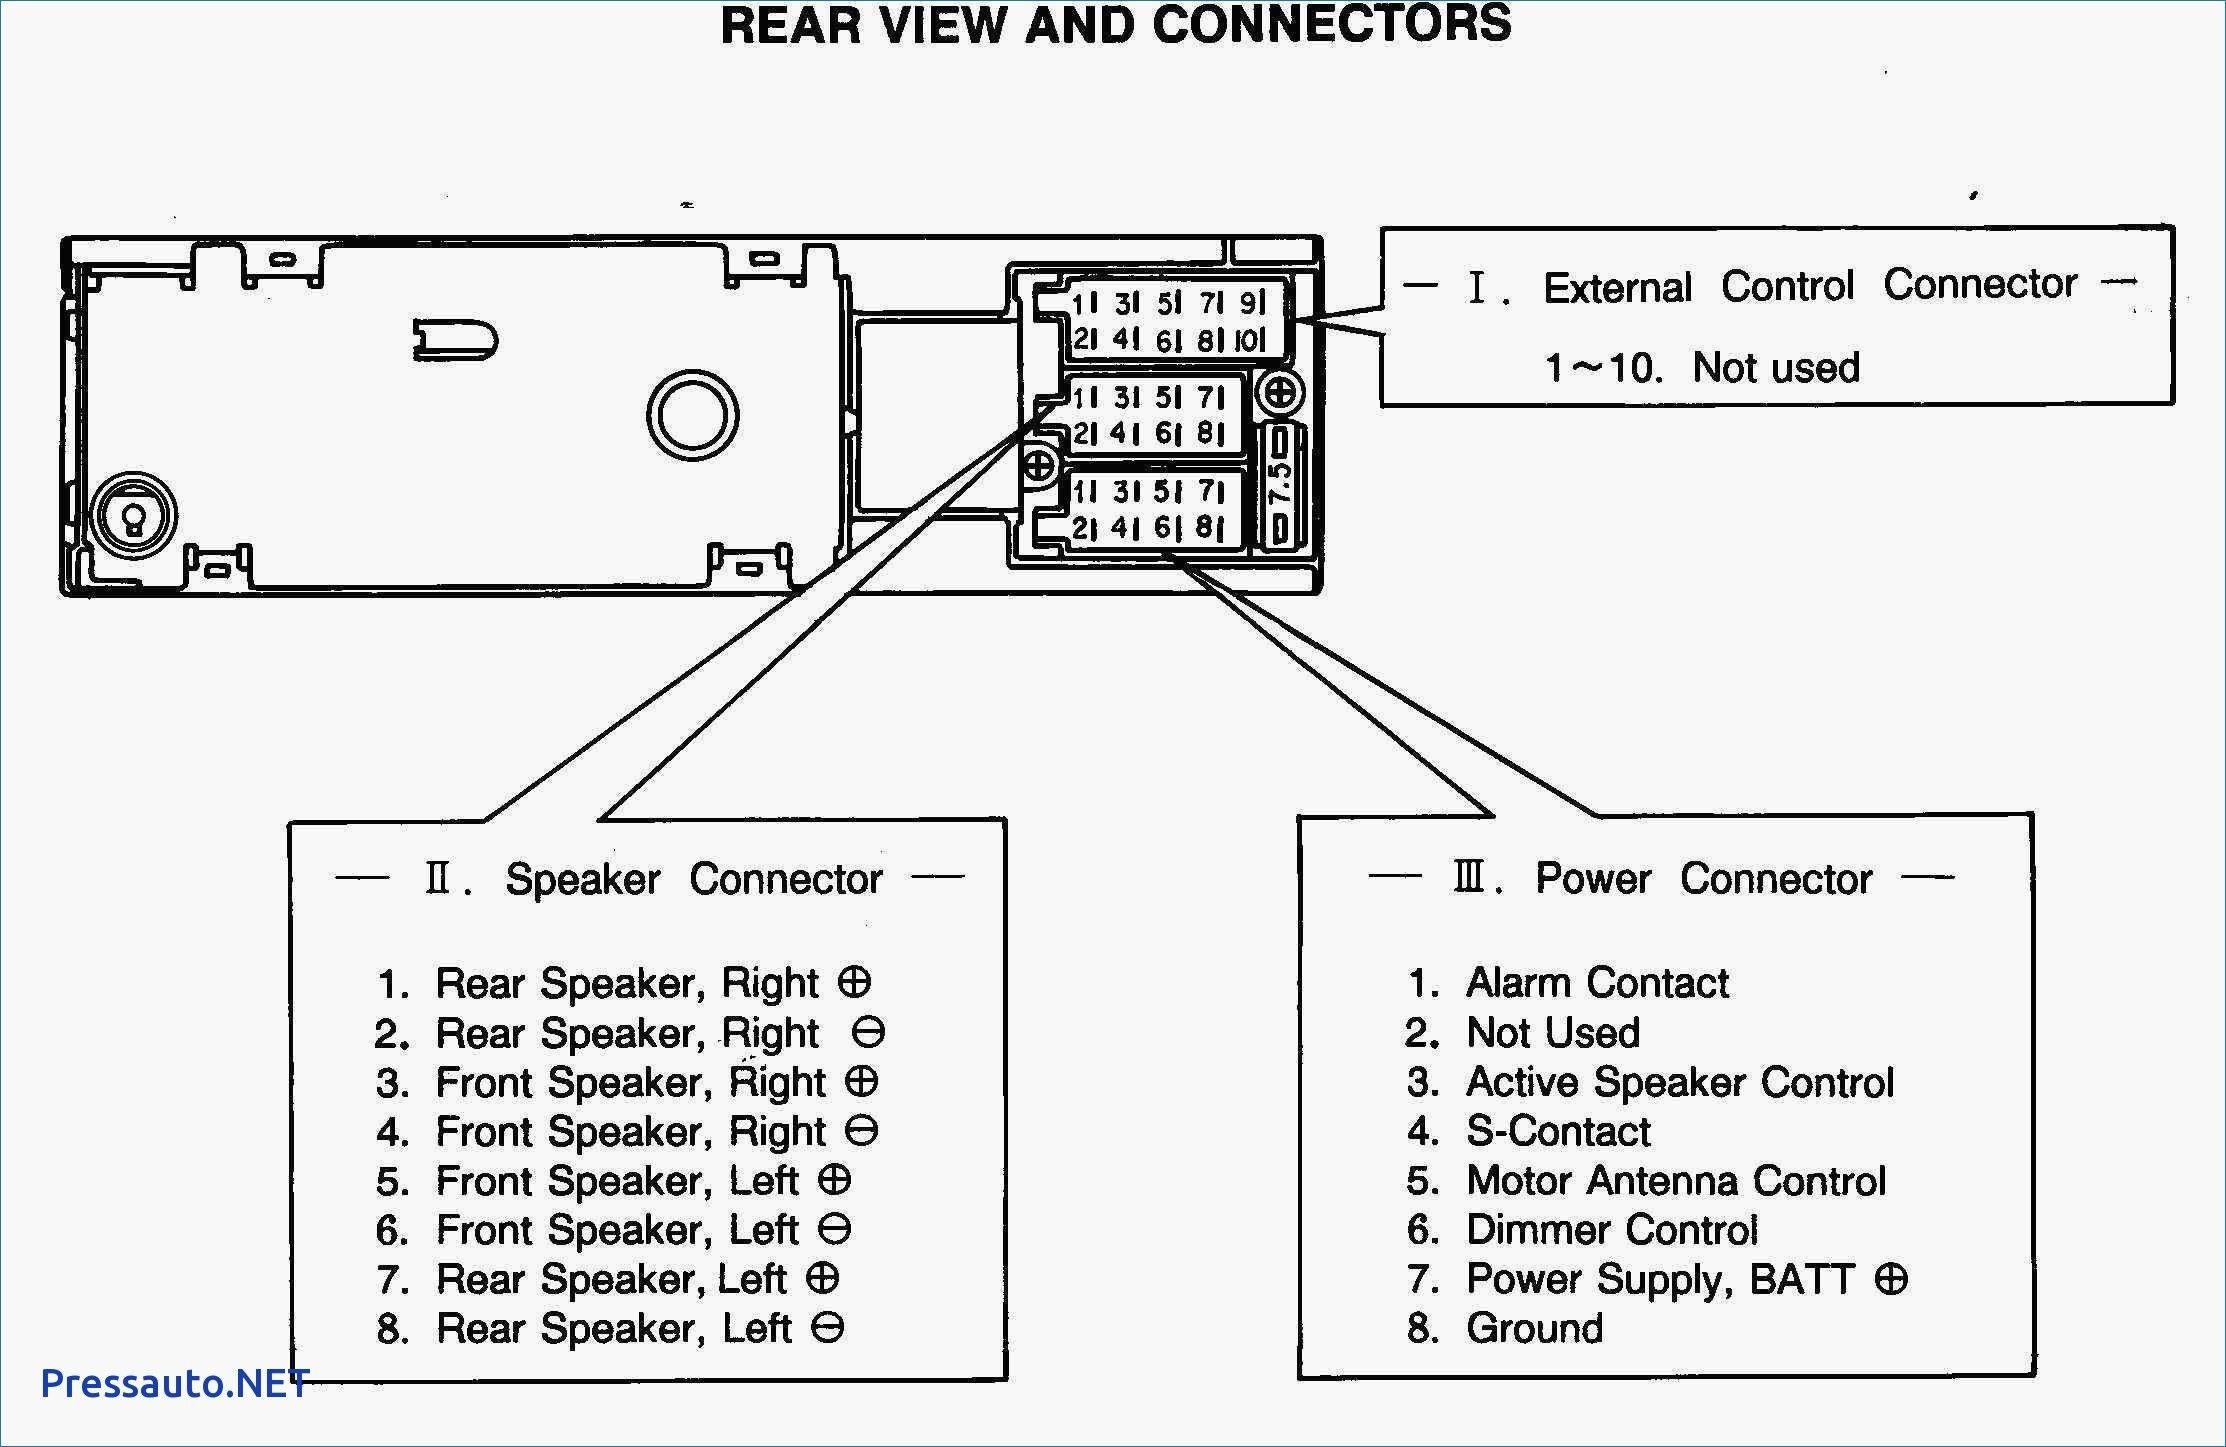 New Audi A4 Door Wiring Diagram Diagram Diagramtemplate Diagramsample Jetta A4 Jetta 2002 Sistema Electrico